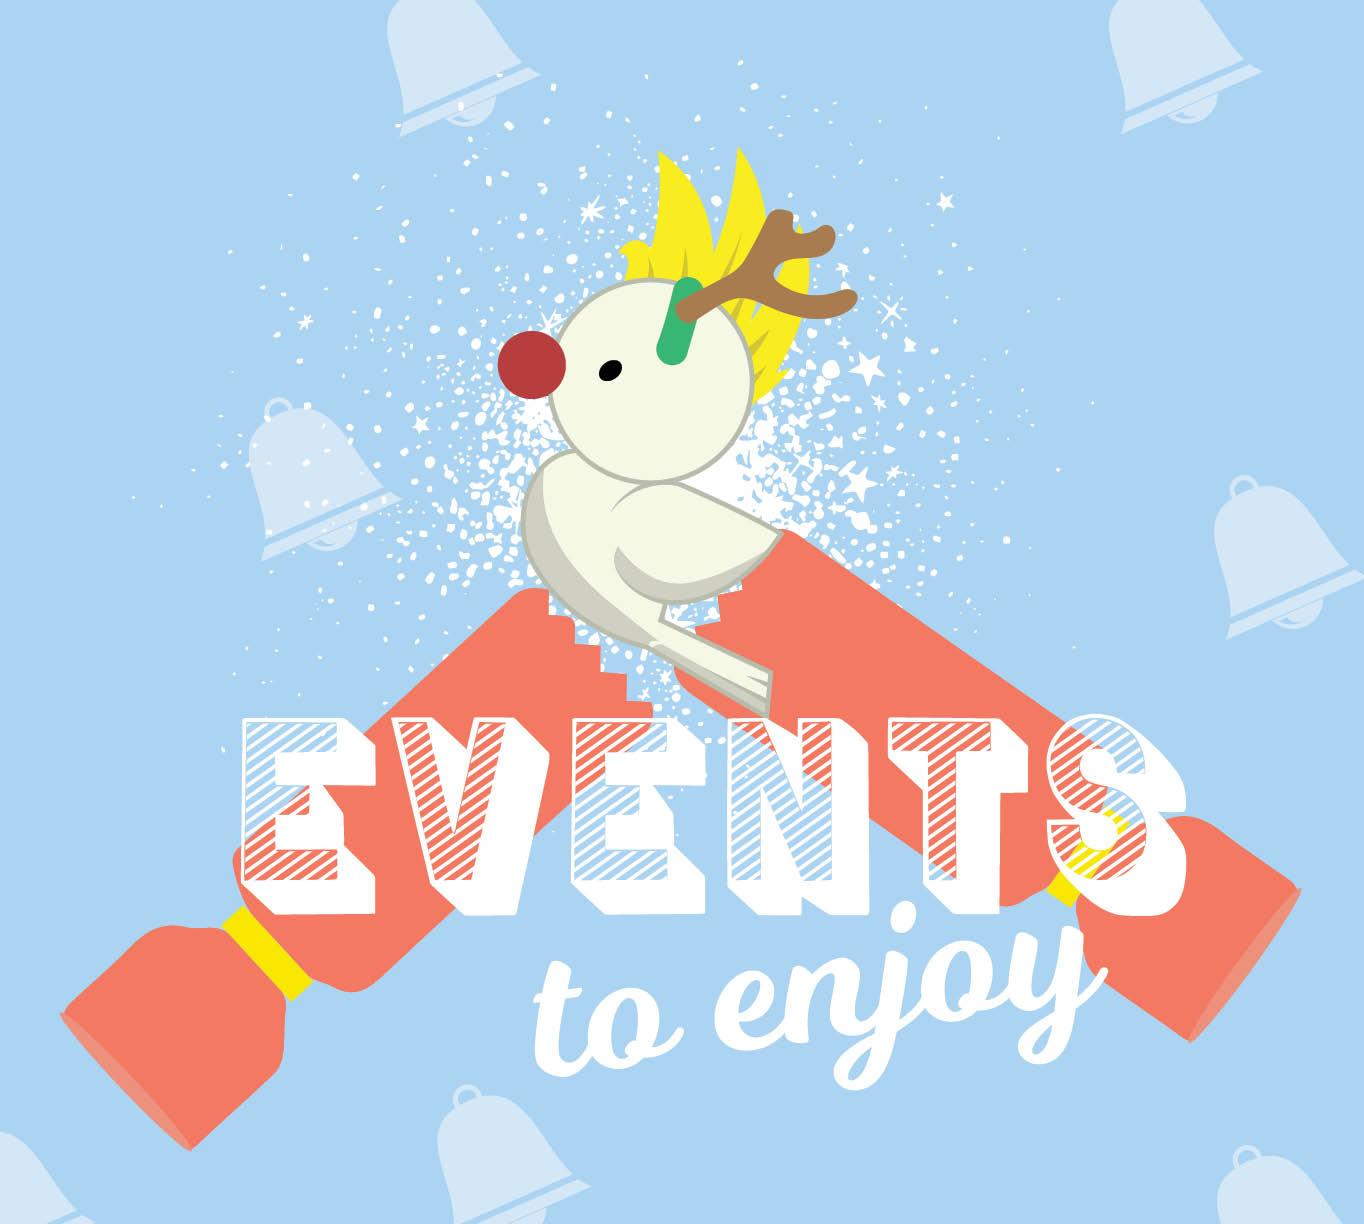 CH4806_Xmas 2019_Web Tiles_Events to enjoy_628x612px